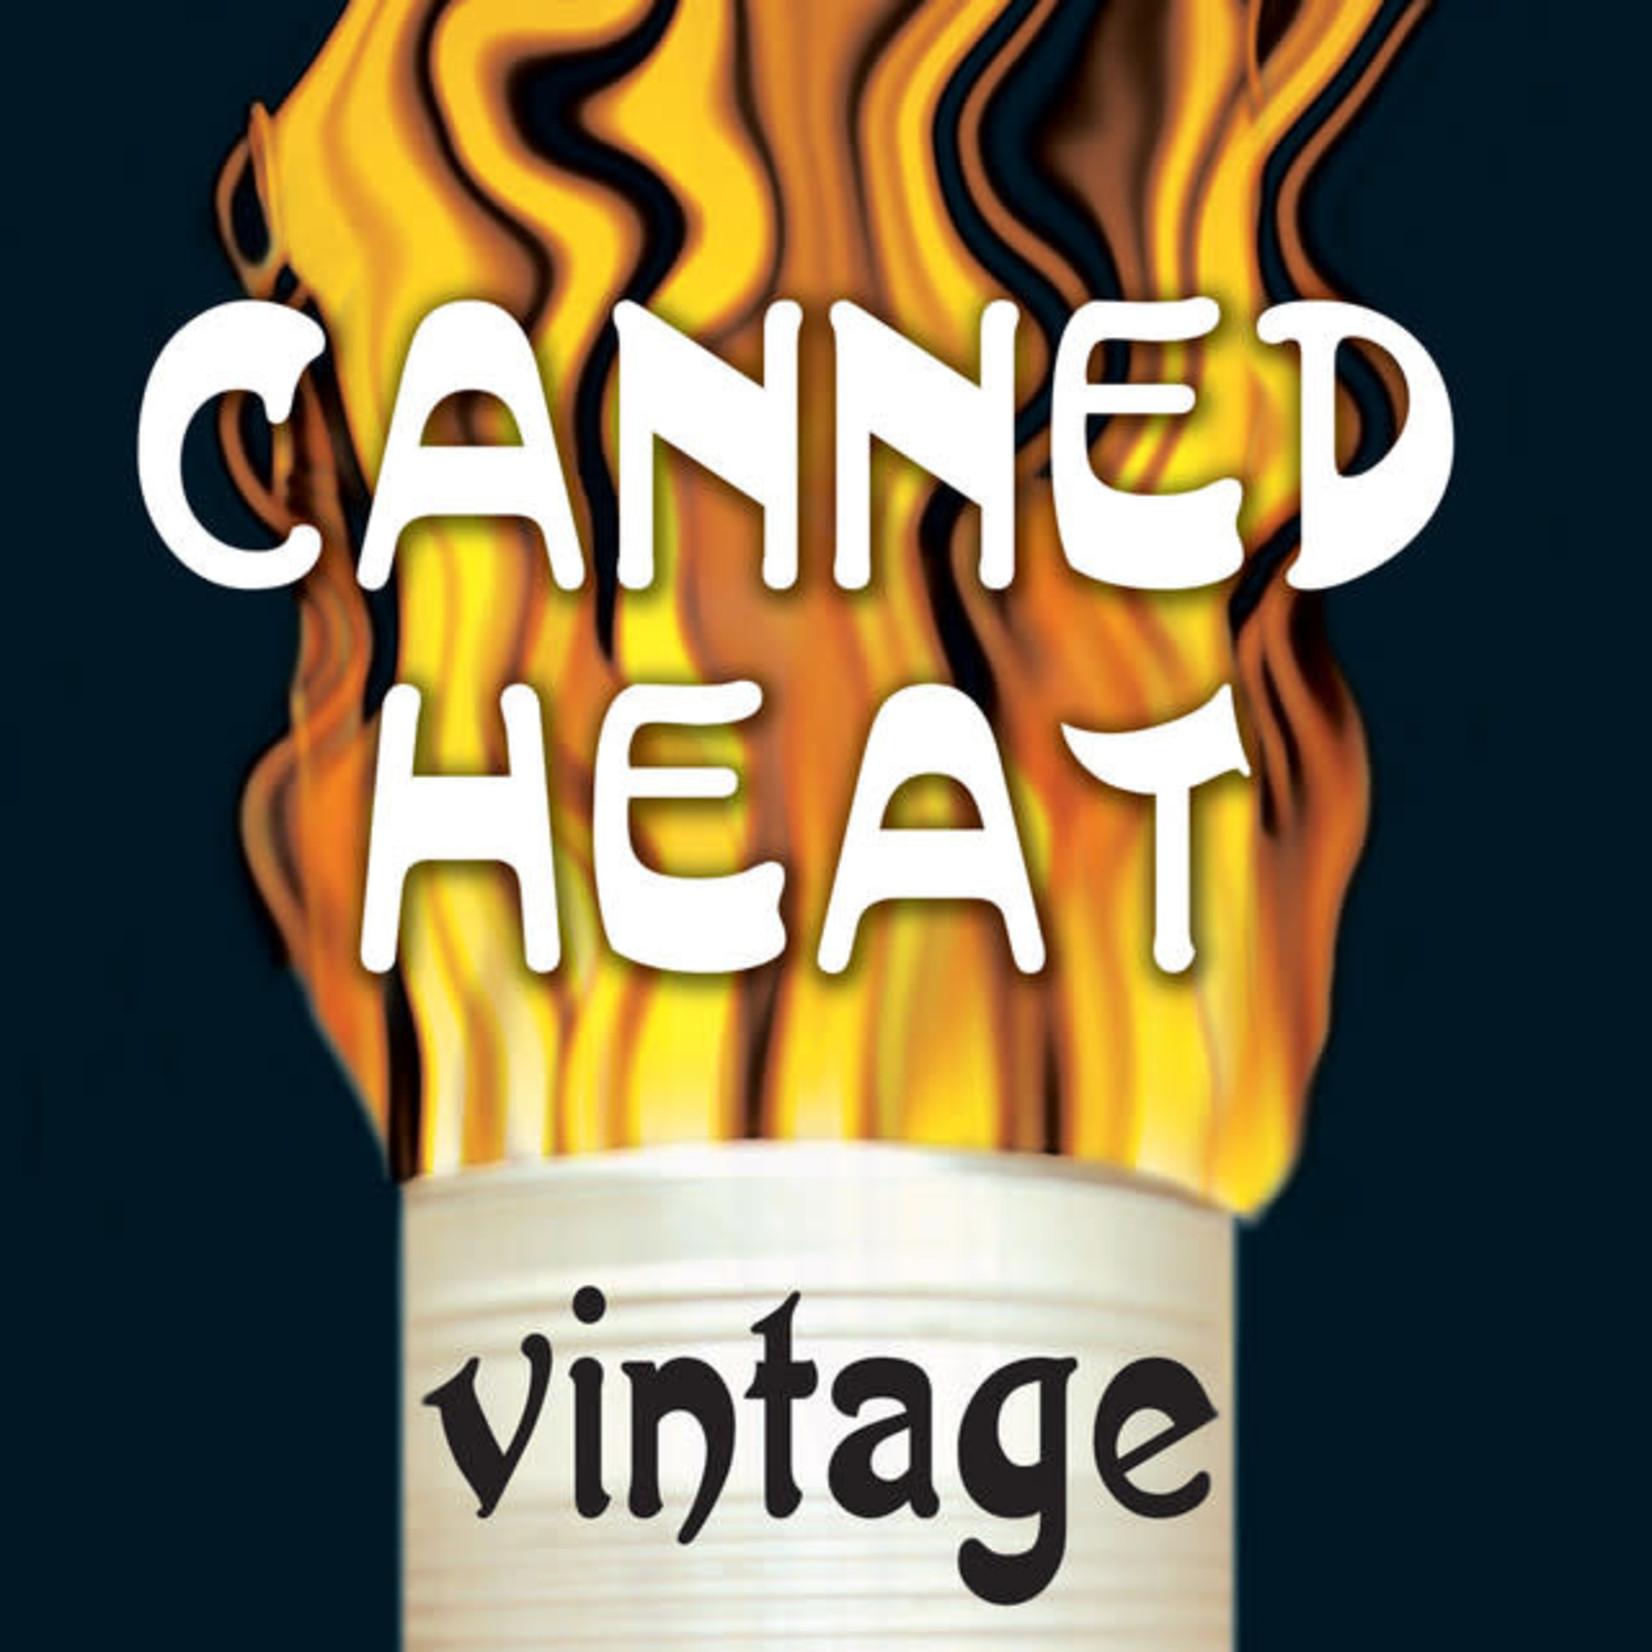 Vinyl Canned Heat - Vintage